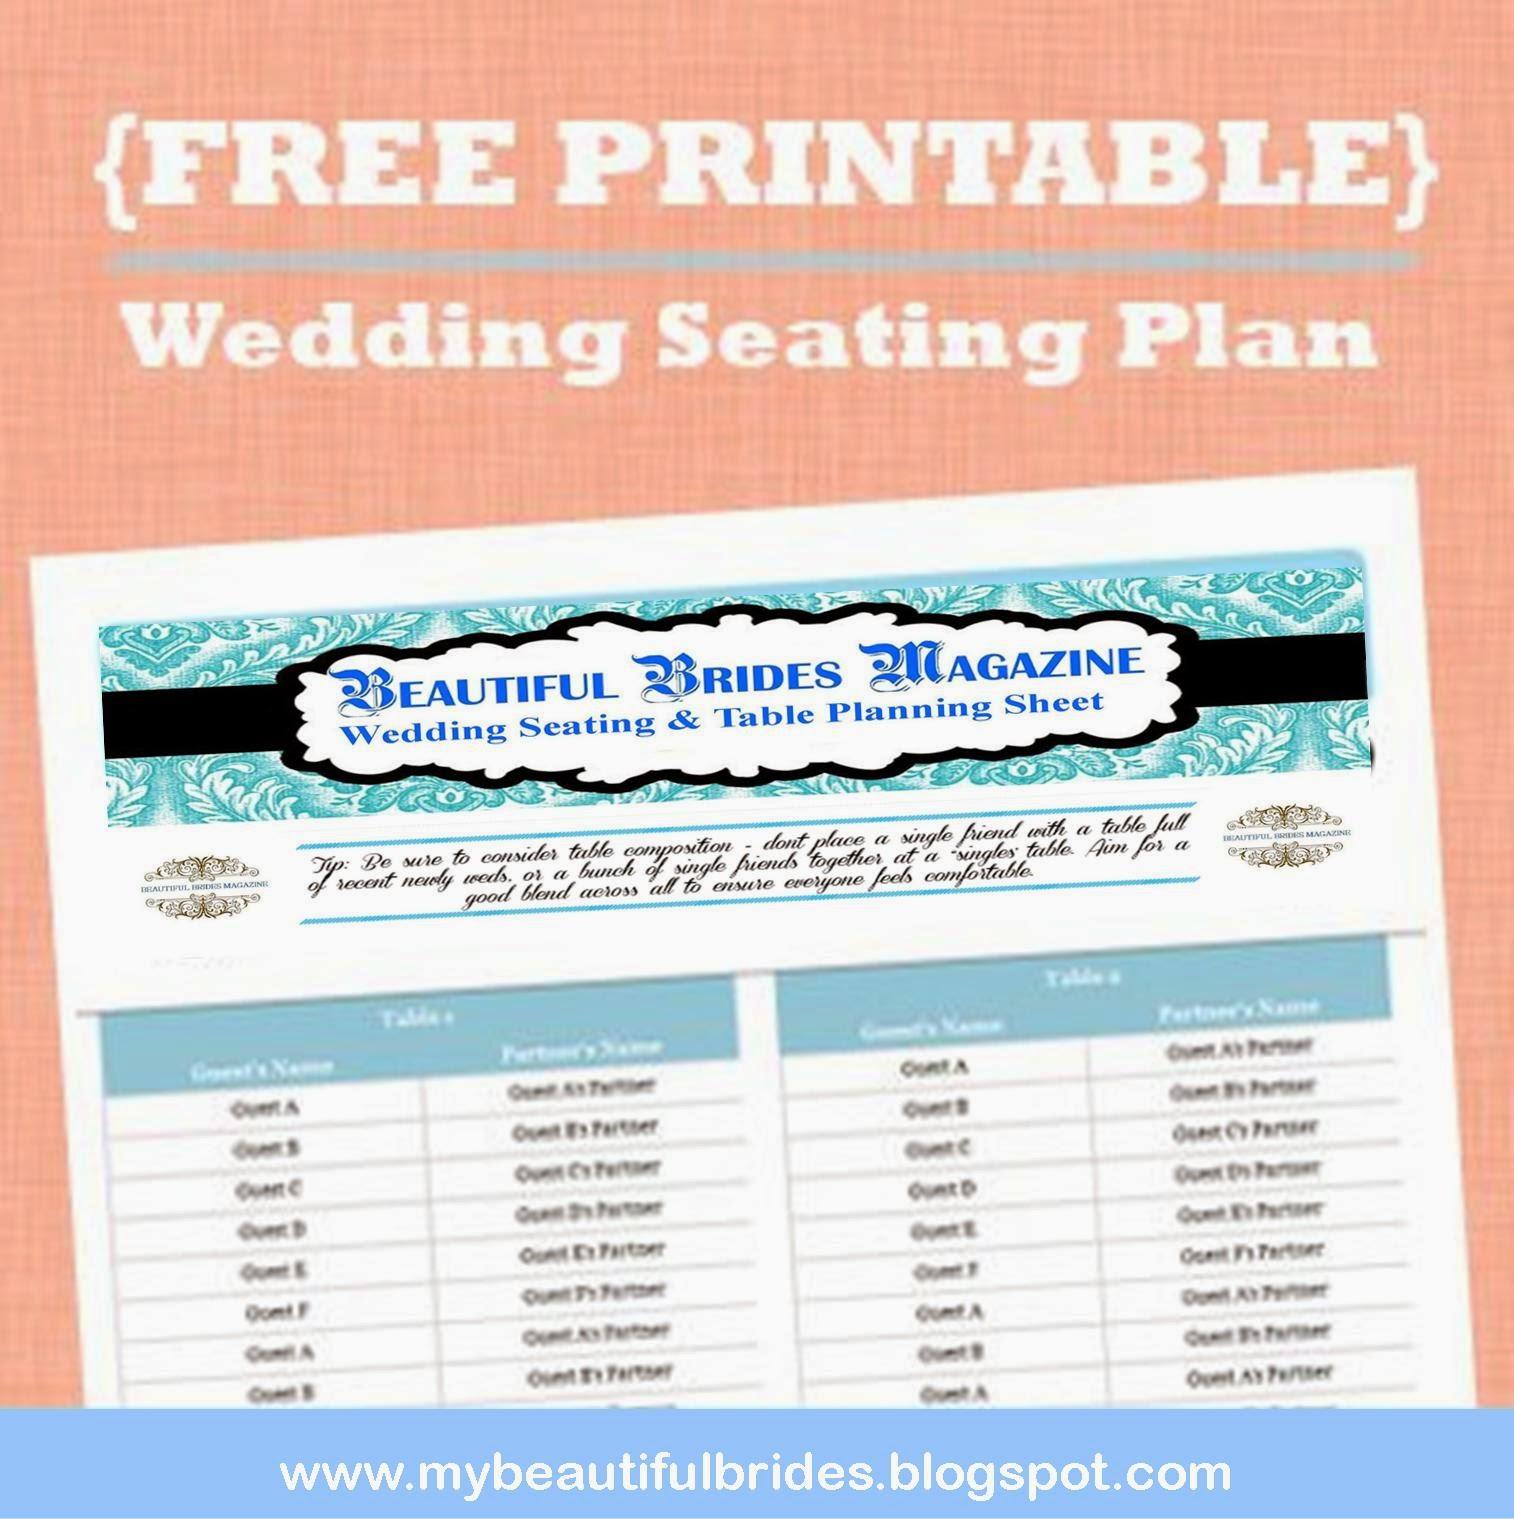 Beautiful Brides Magazine: Wedding Table Planner Seating